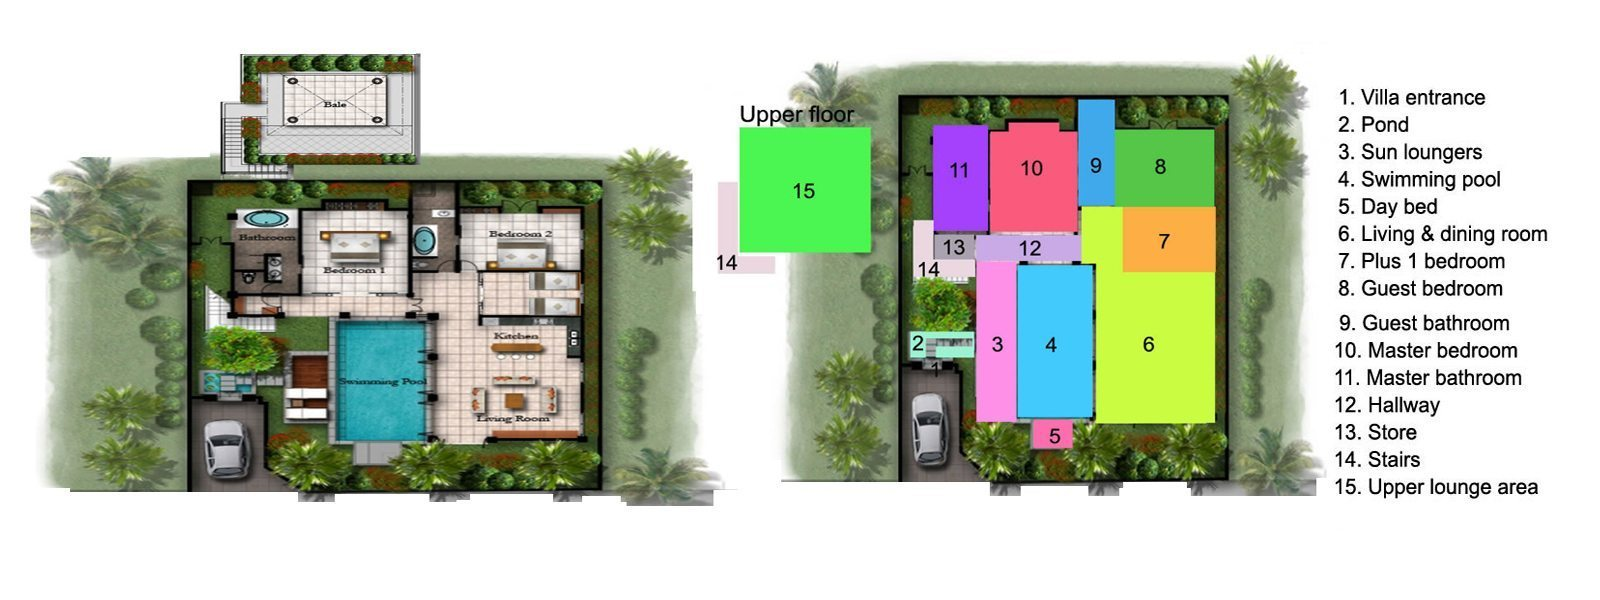 Villa Amala Floorplan | Seminyak, Bali